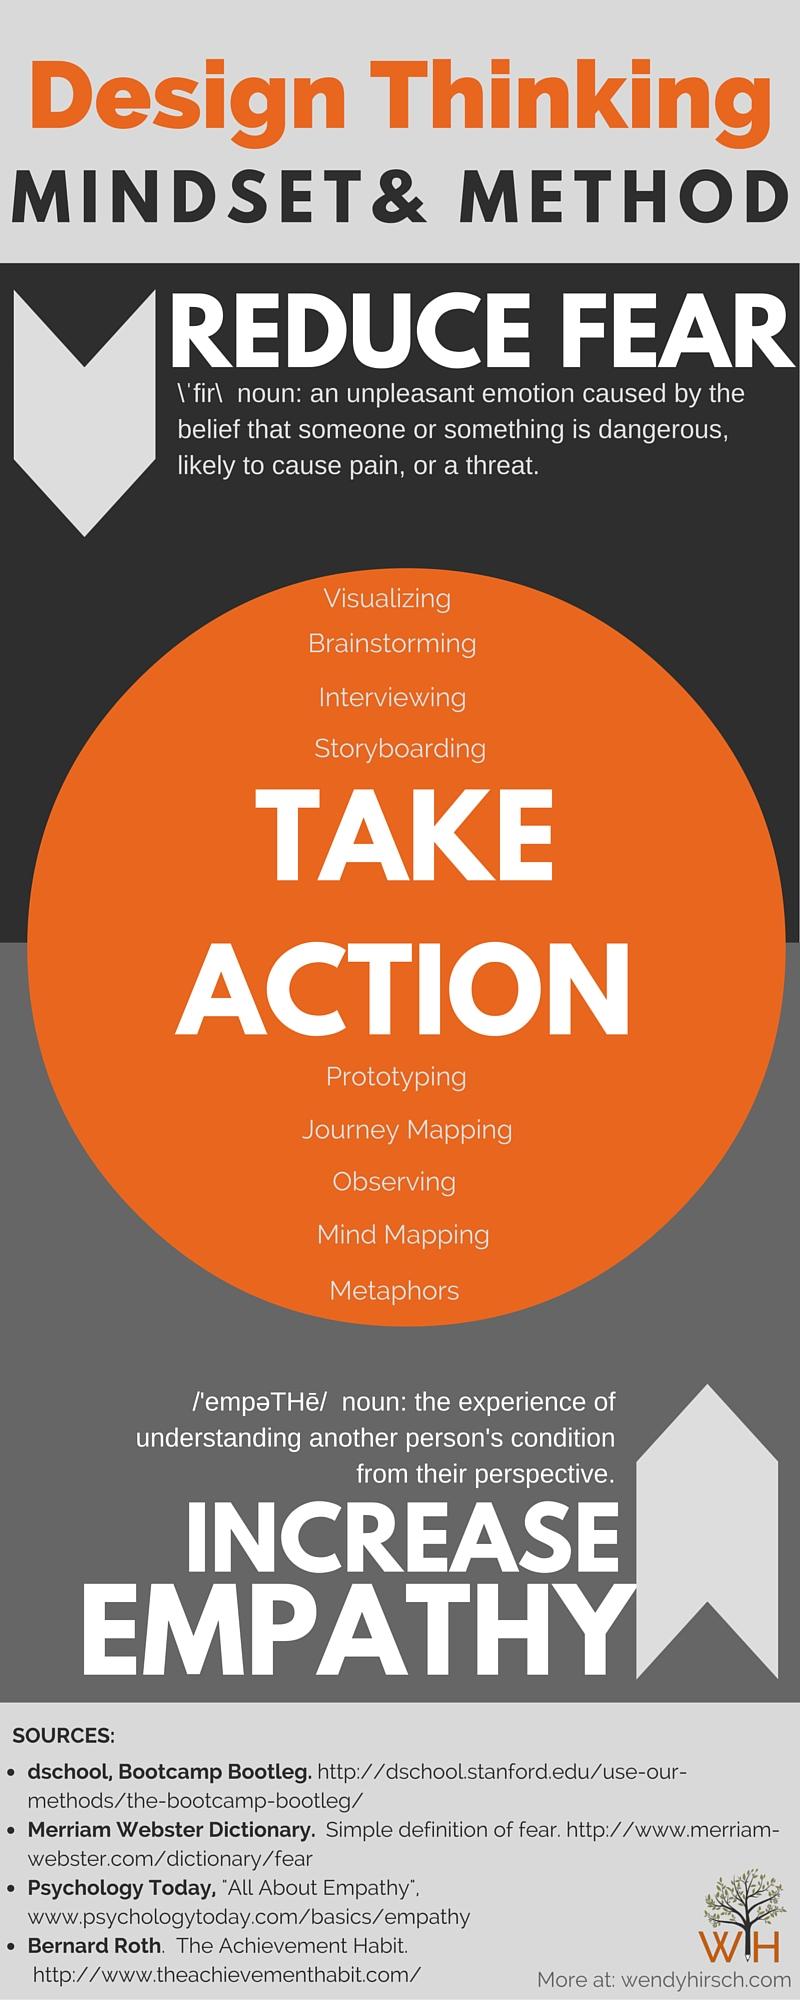 Design Thinking Method & Mindset.jpg